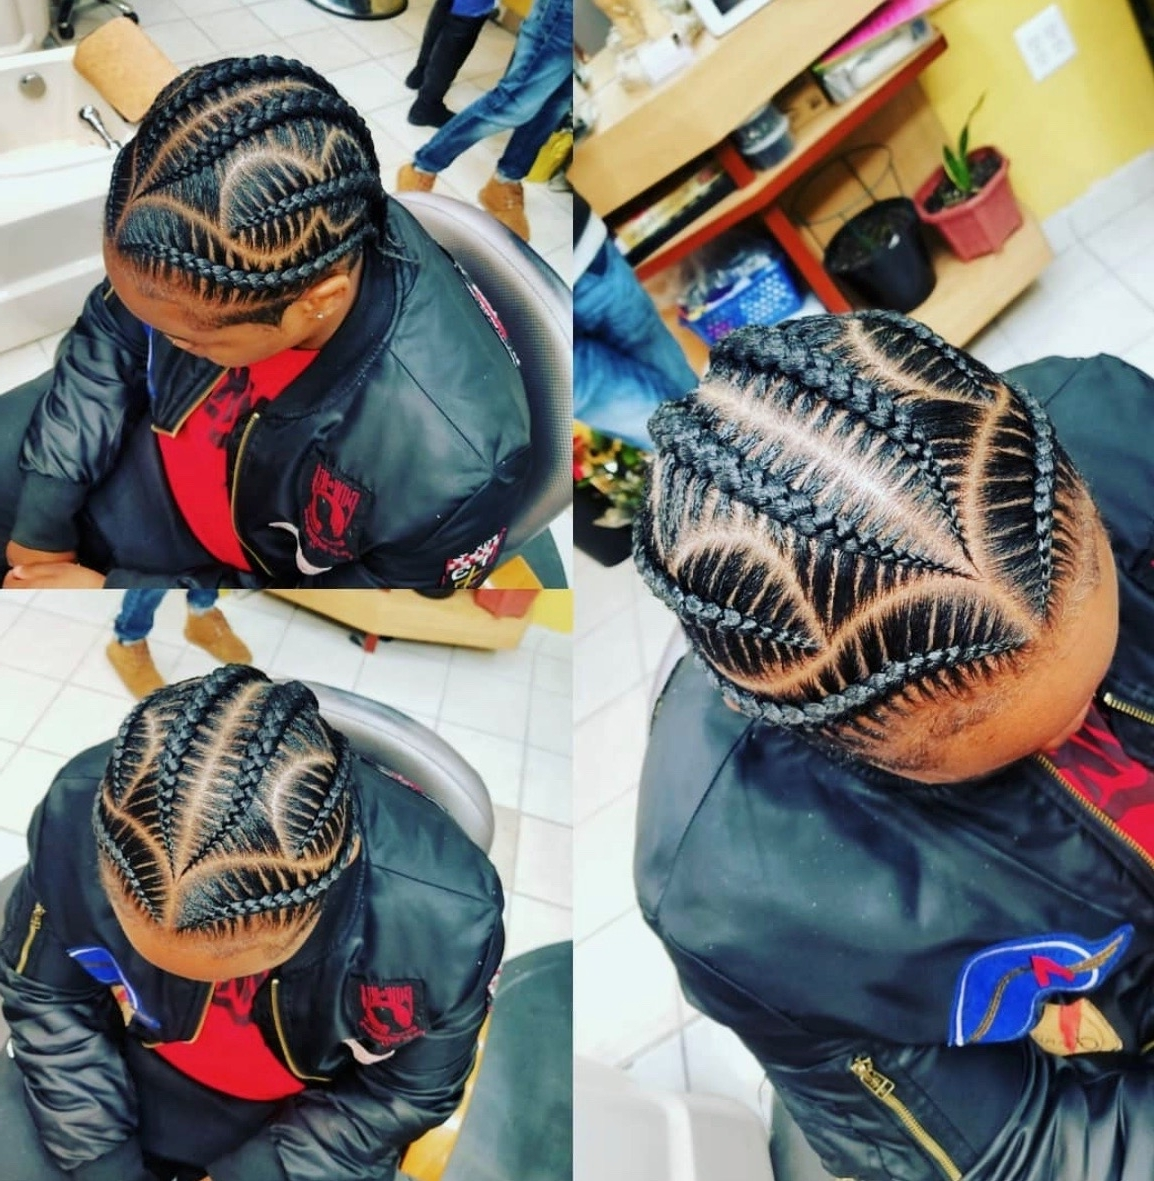 Braid Hairstyles 2018 – 40 Ghana Braid, Box Braid, Goddess Braid With Well Known Feed In Braids Hairstyles (View 4 of 15)